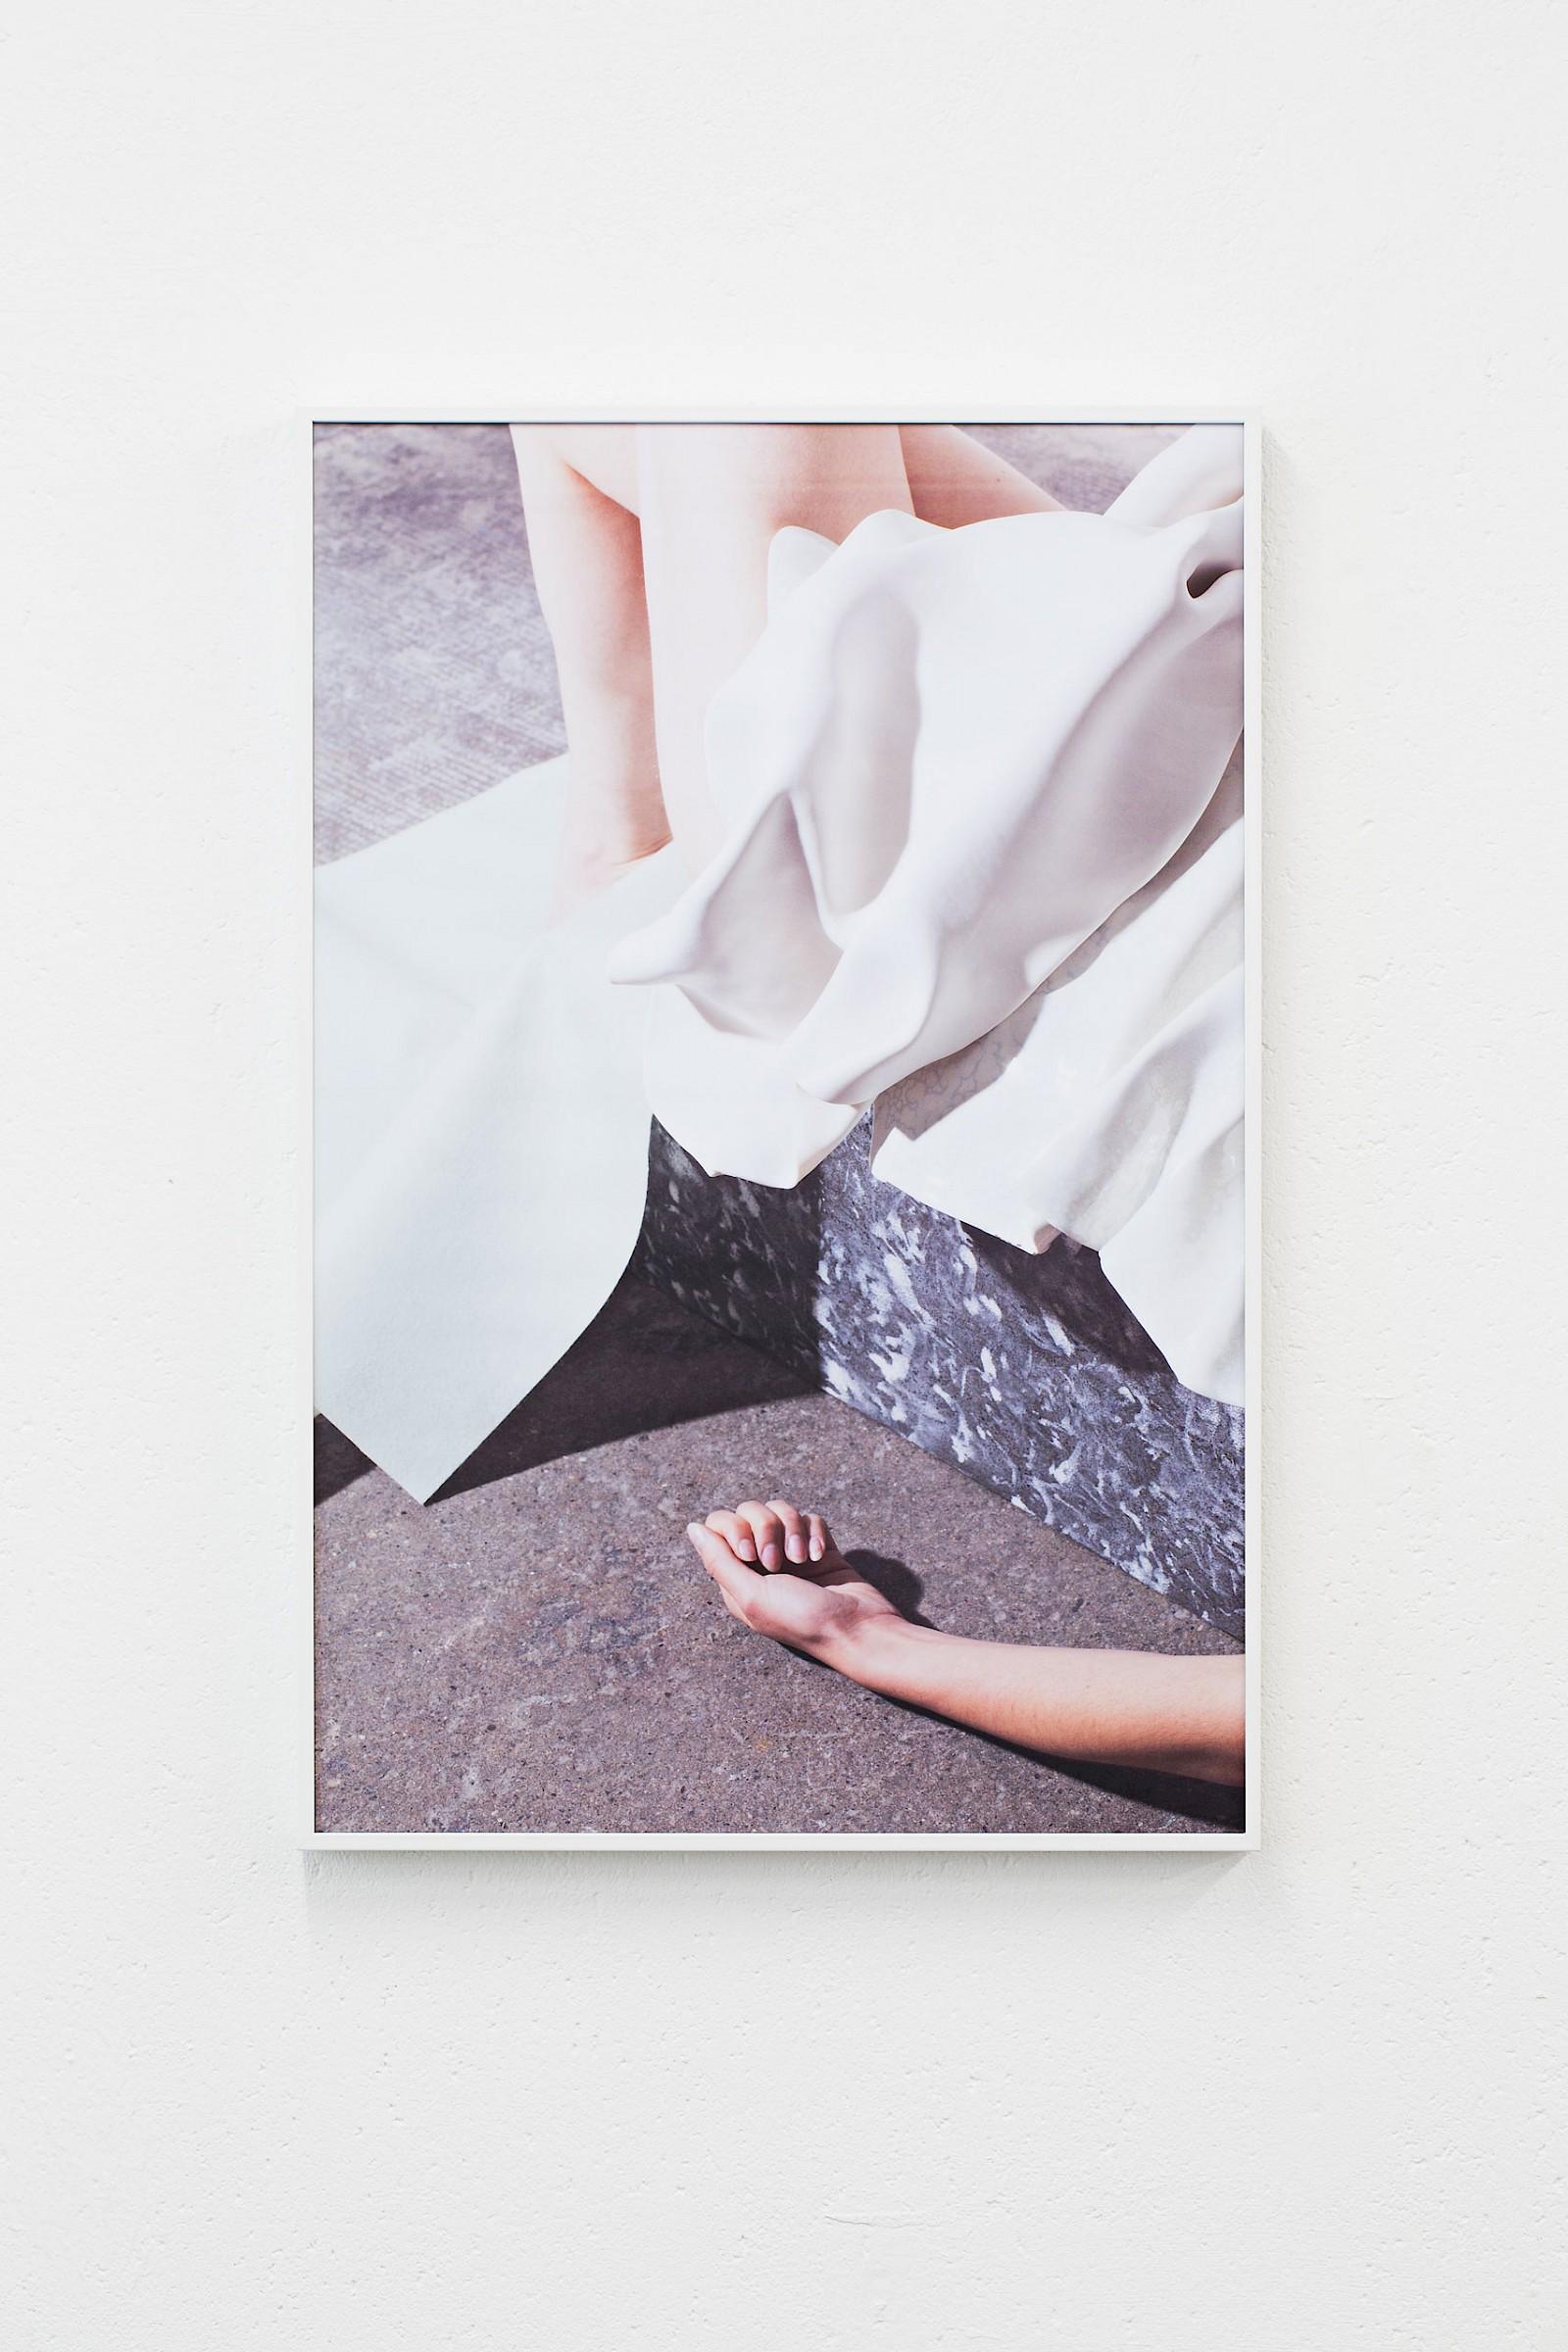 Image - Photograph C-Print framed, 57 × 42cm